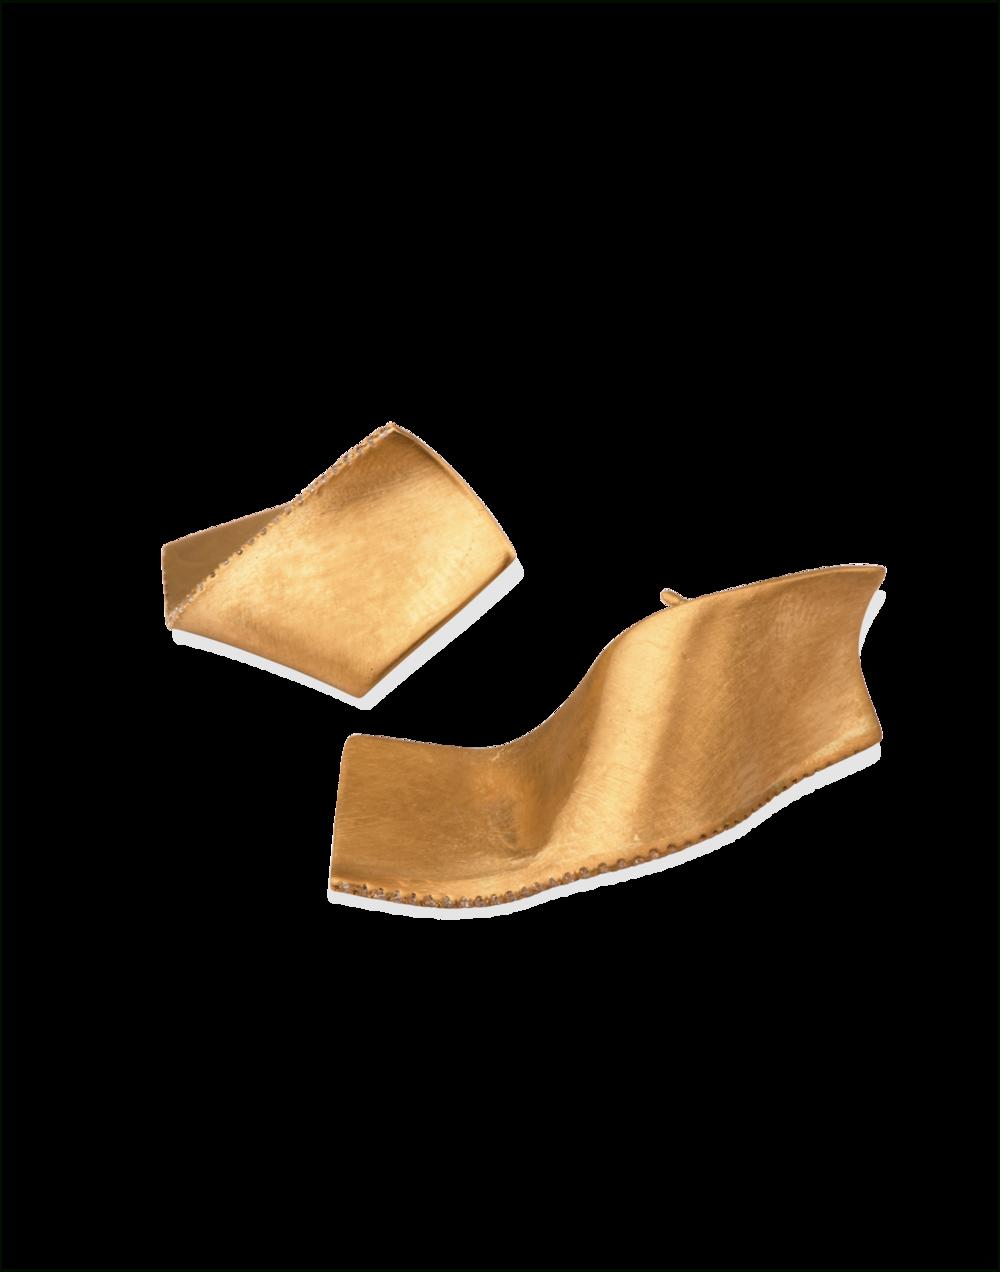 Gold-Diamond-Earrings-Memories-of-Water-Completedworks-Fine-Jewellery-4-1.png